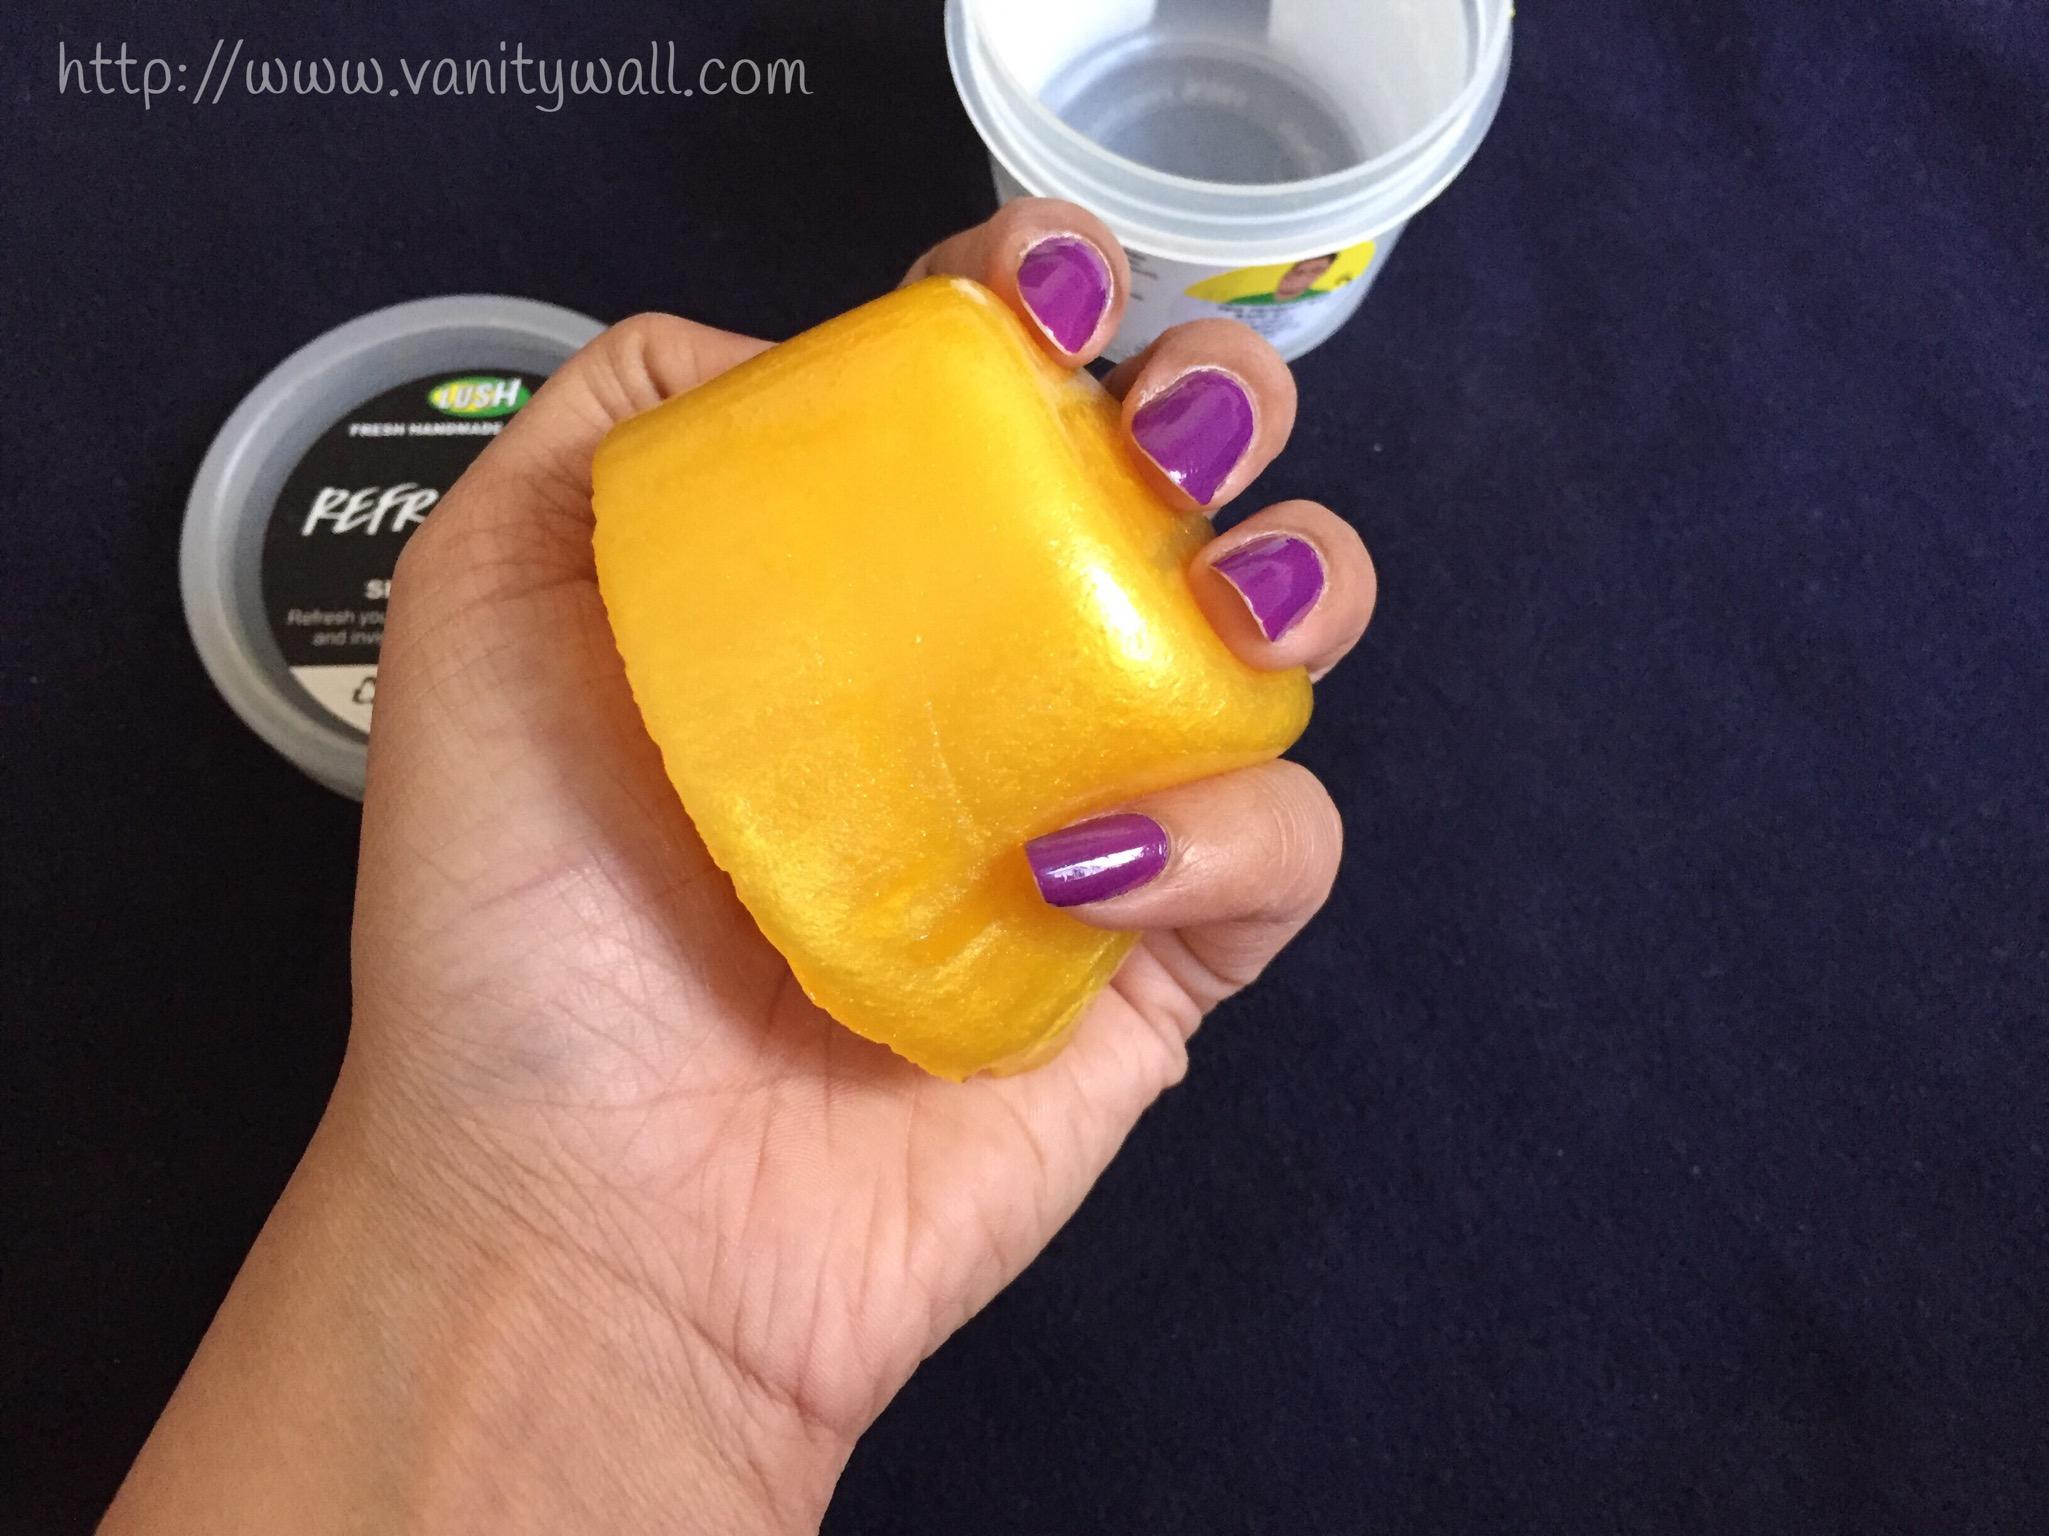 lush refresher shower jelly